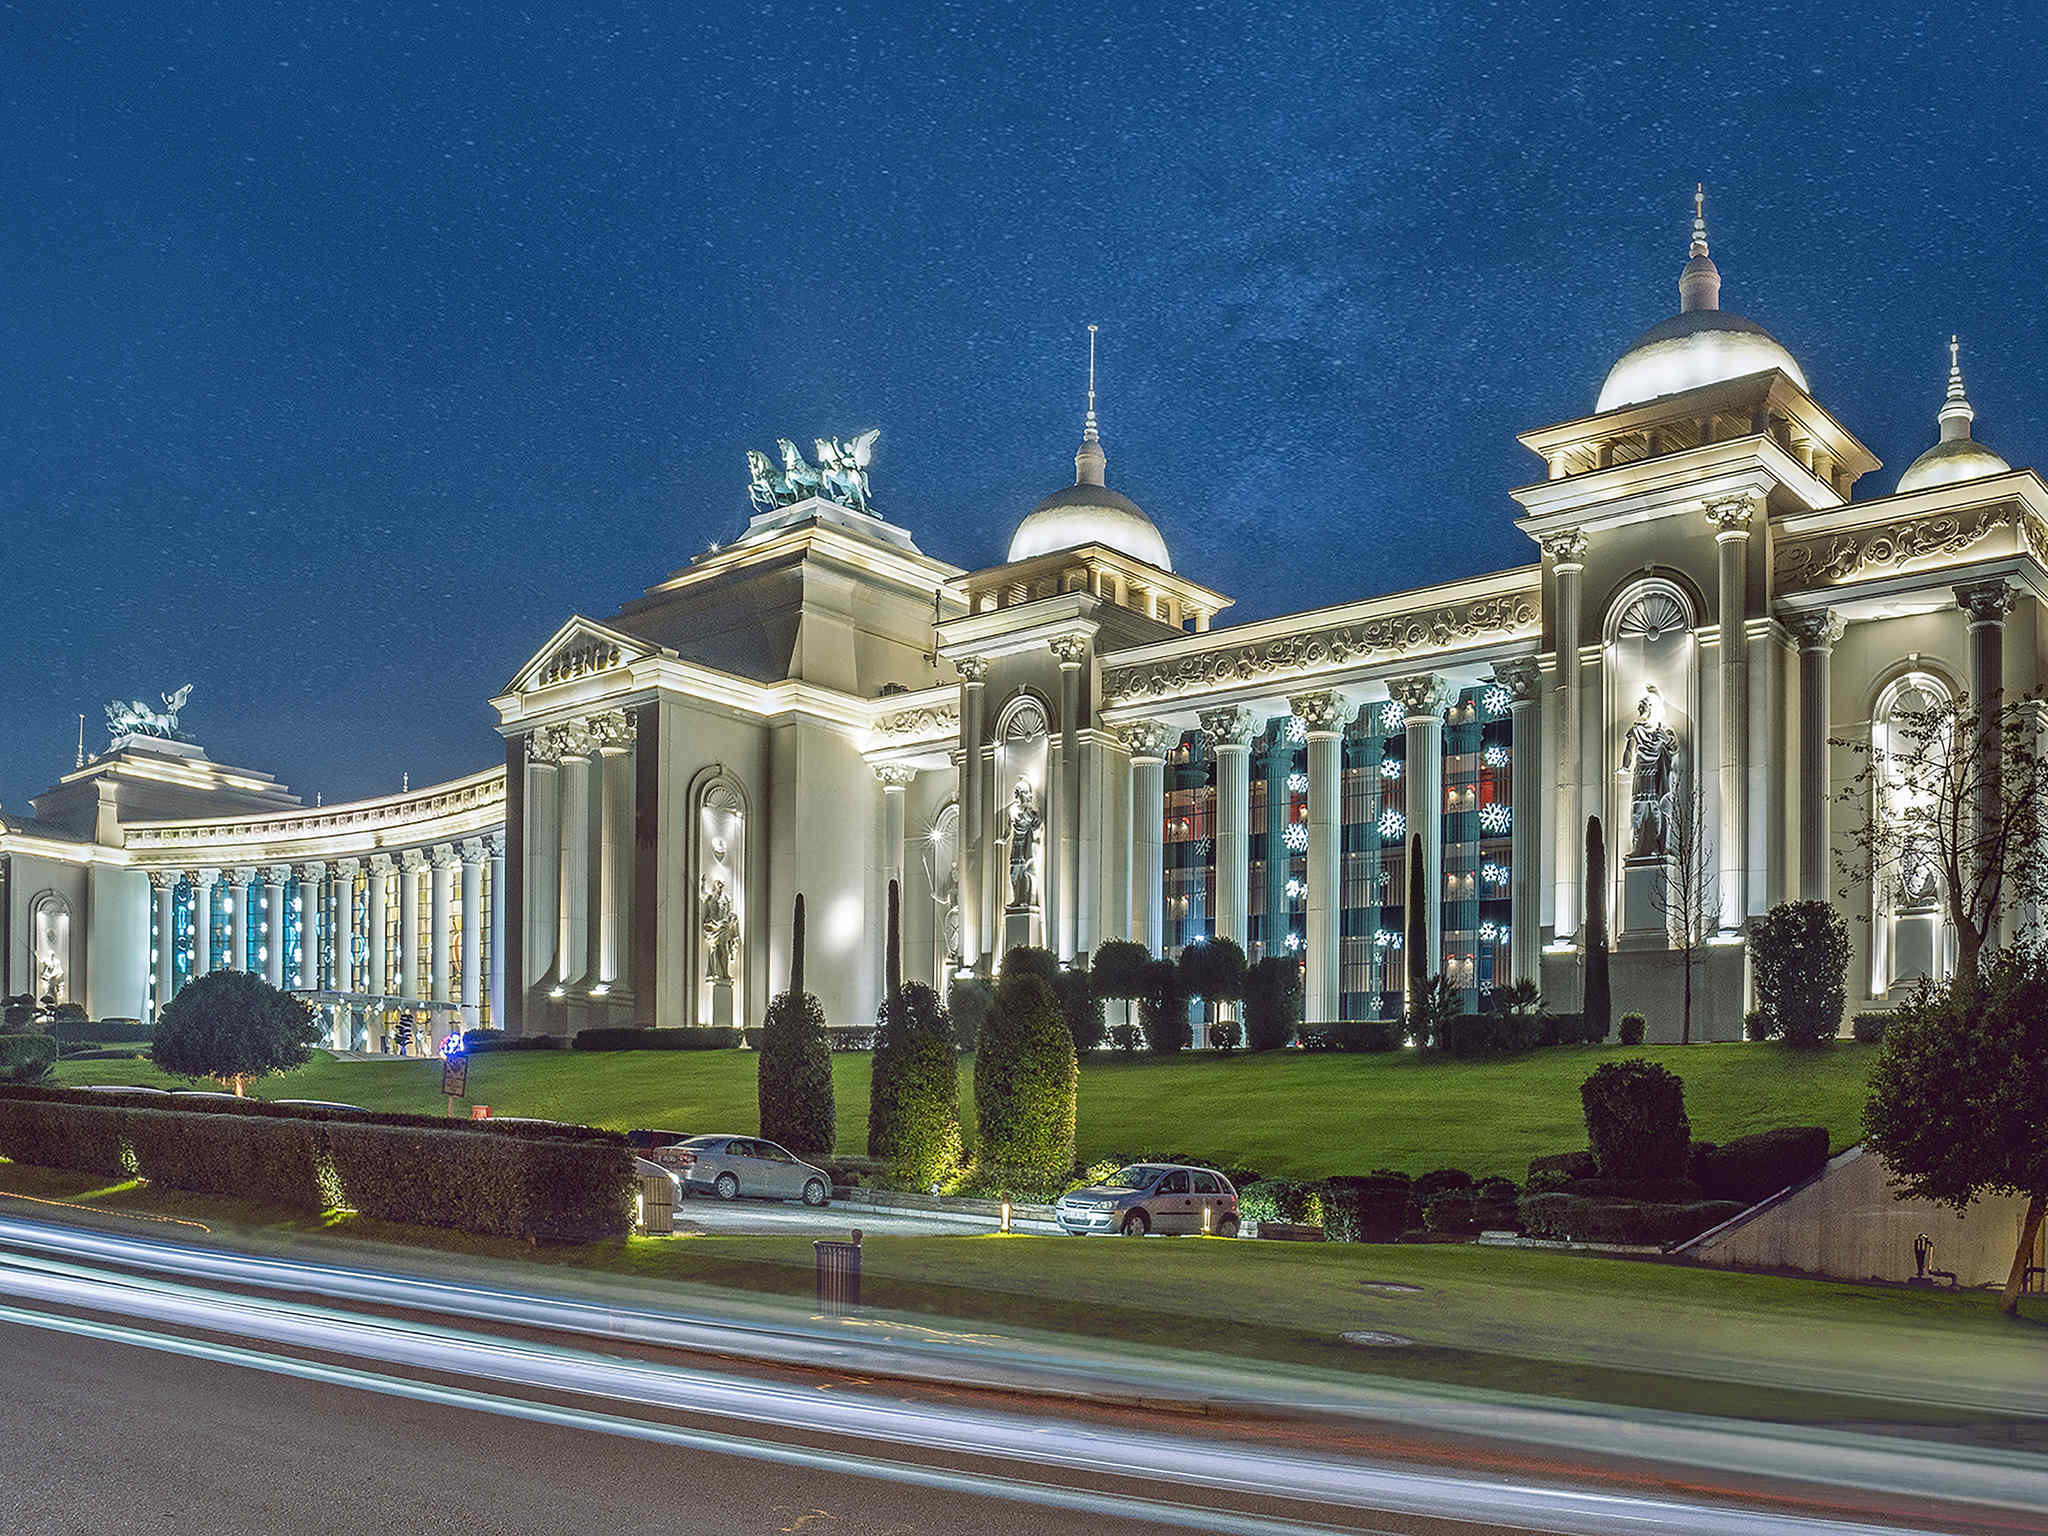 Hotel - The Land of Legends Kingdom